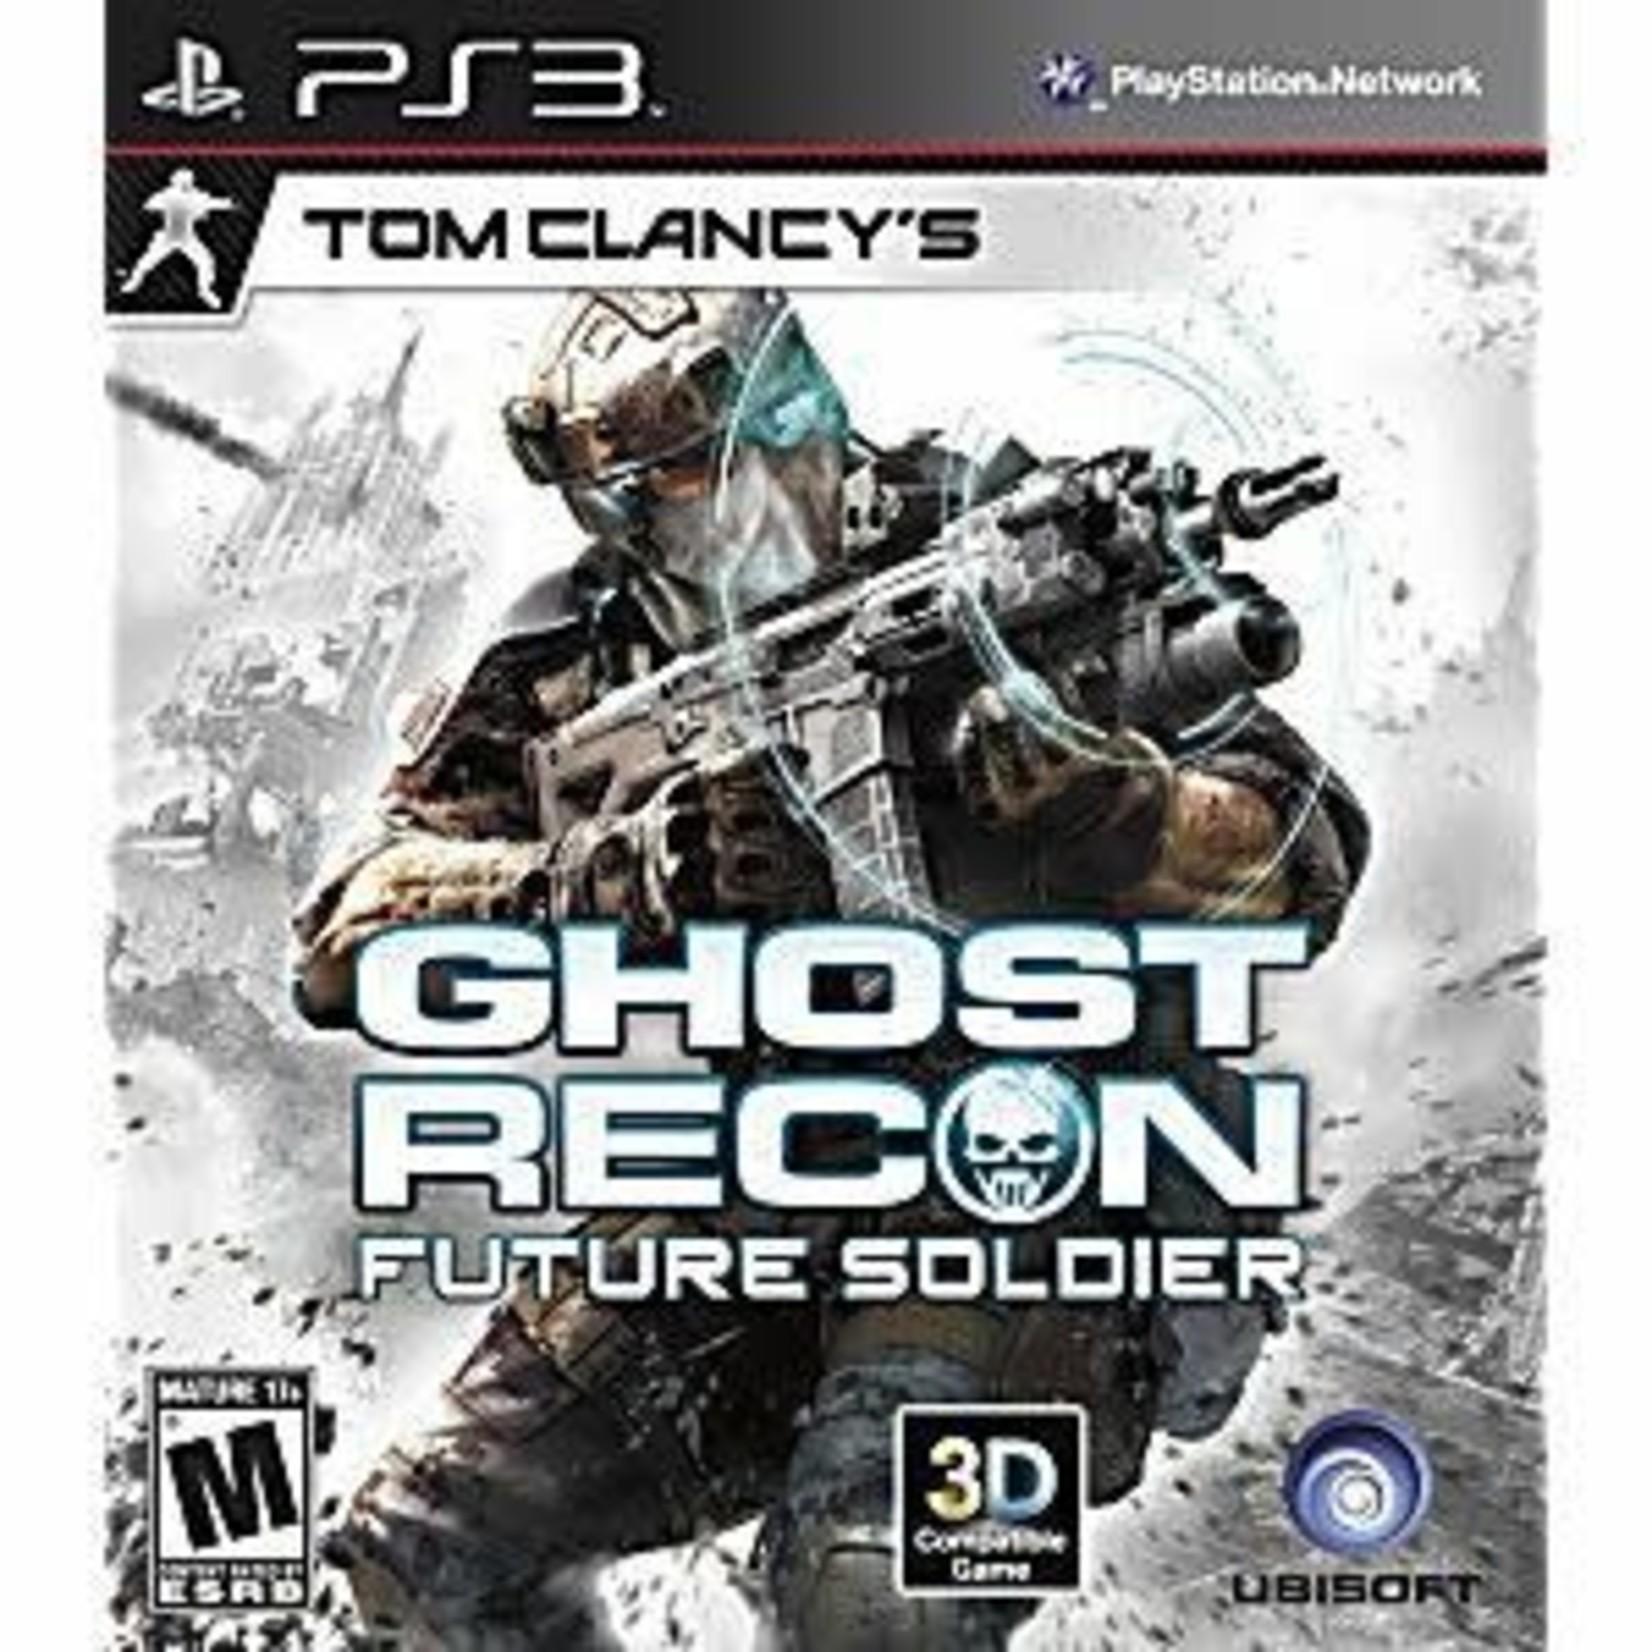 PS3U-Tom Clancy's Ghost Recon Future Soldier